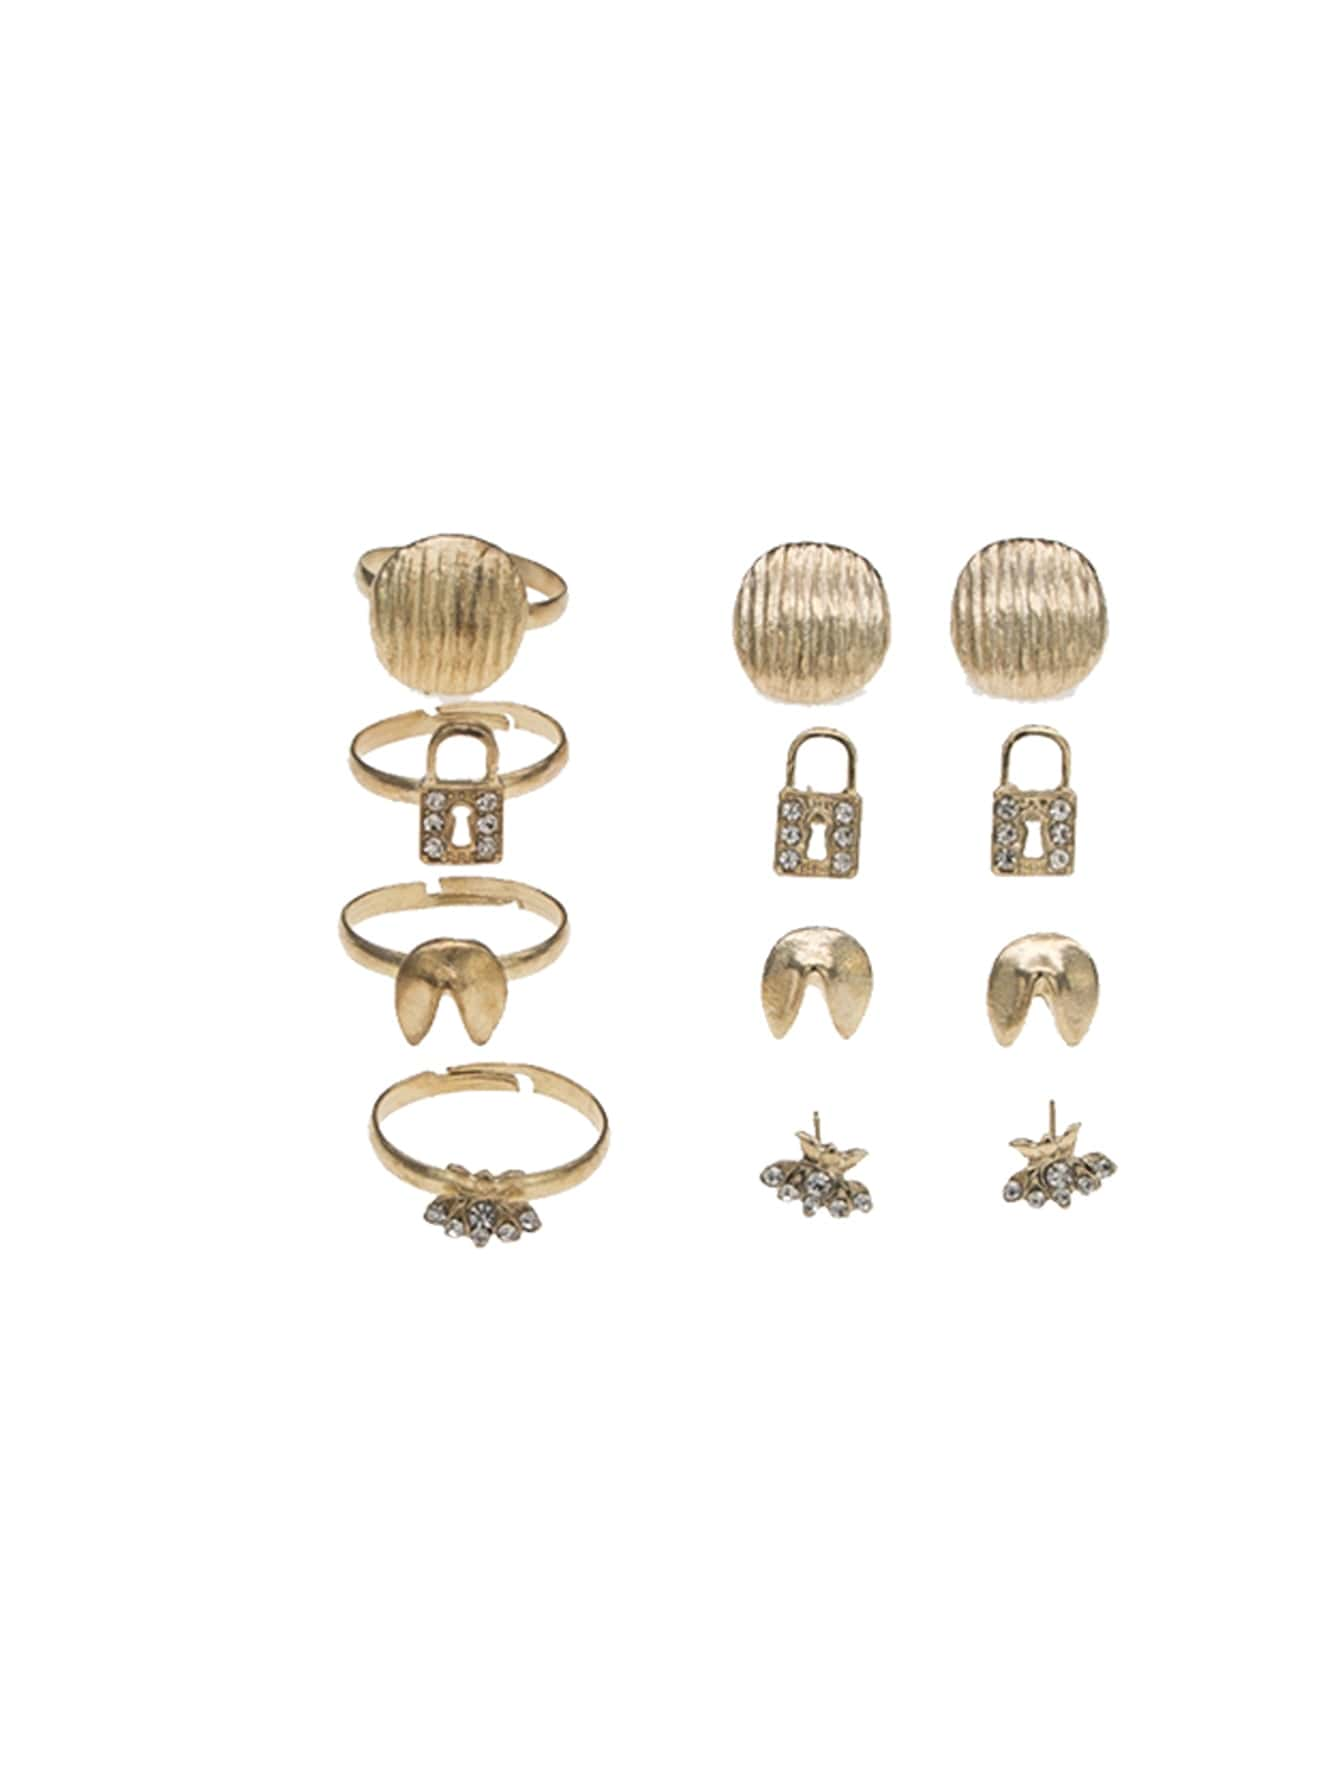 Lock Detail Earrings 4pairs & Ring Set 4pcs